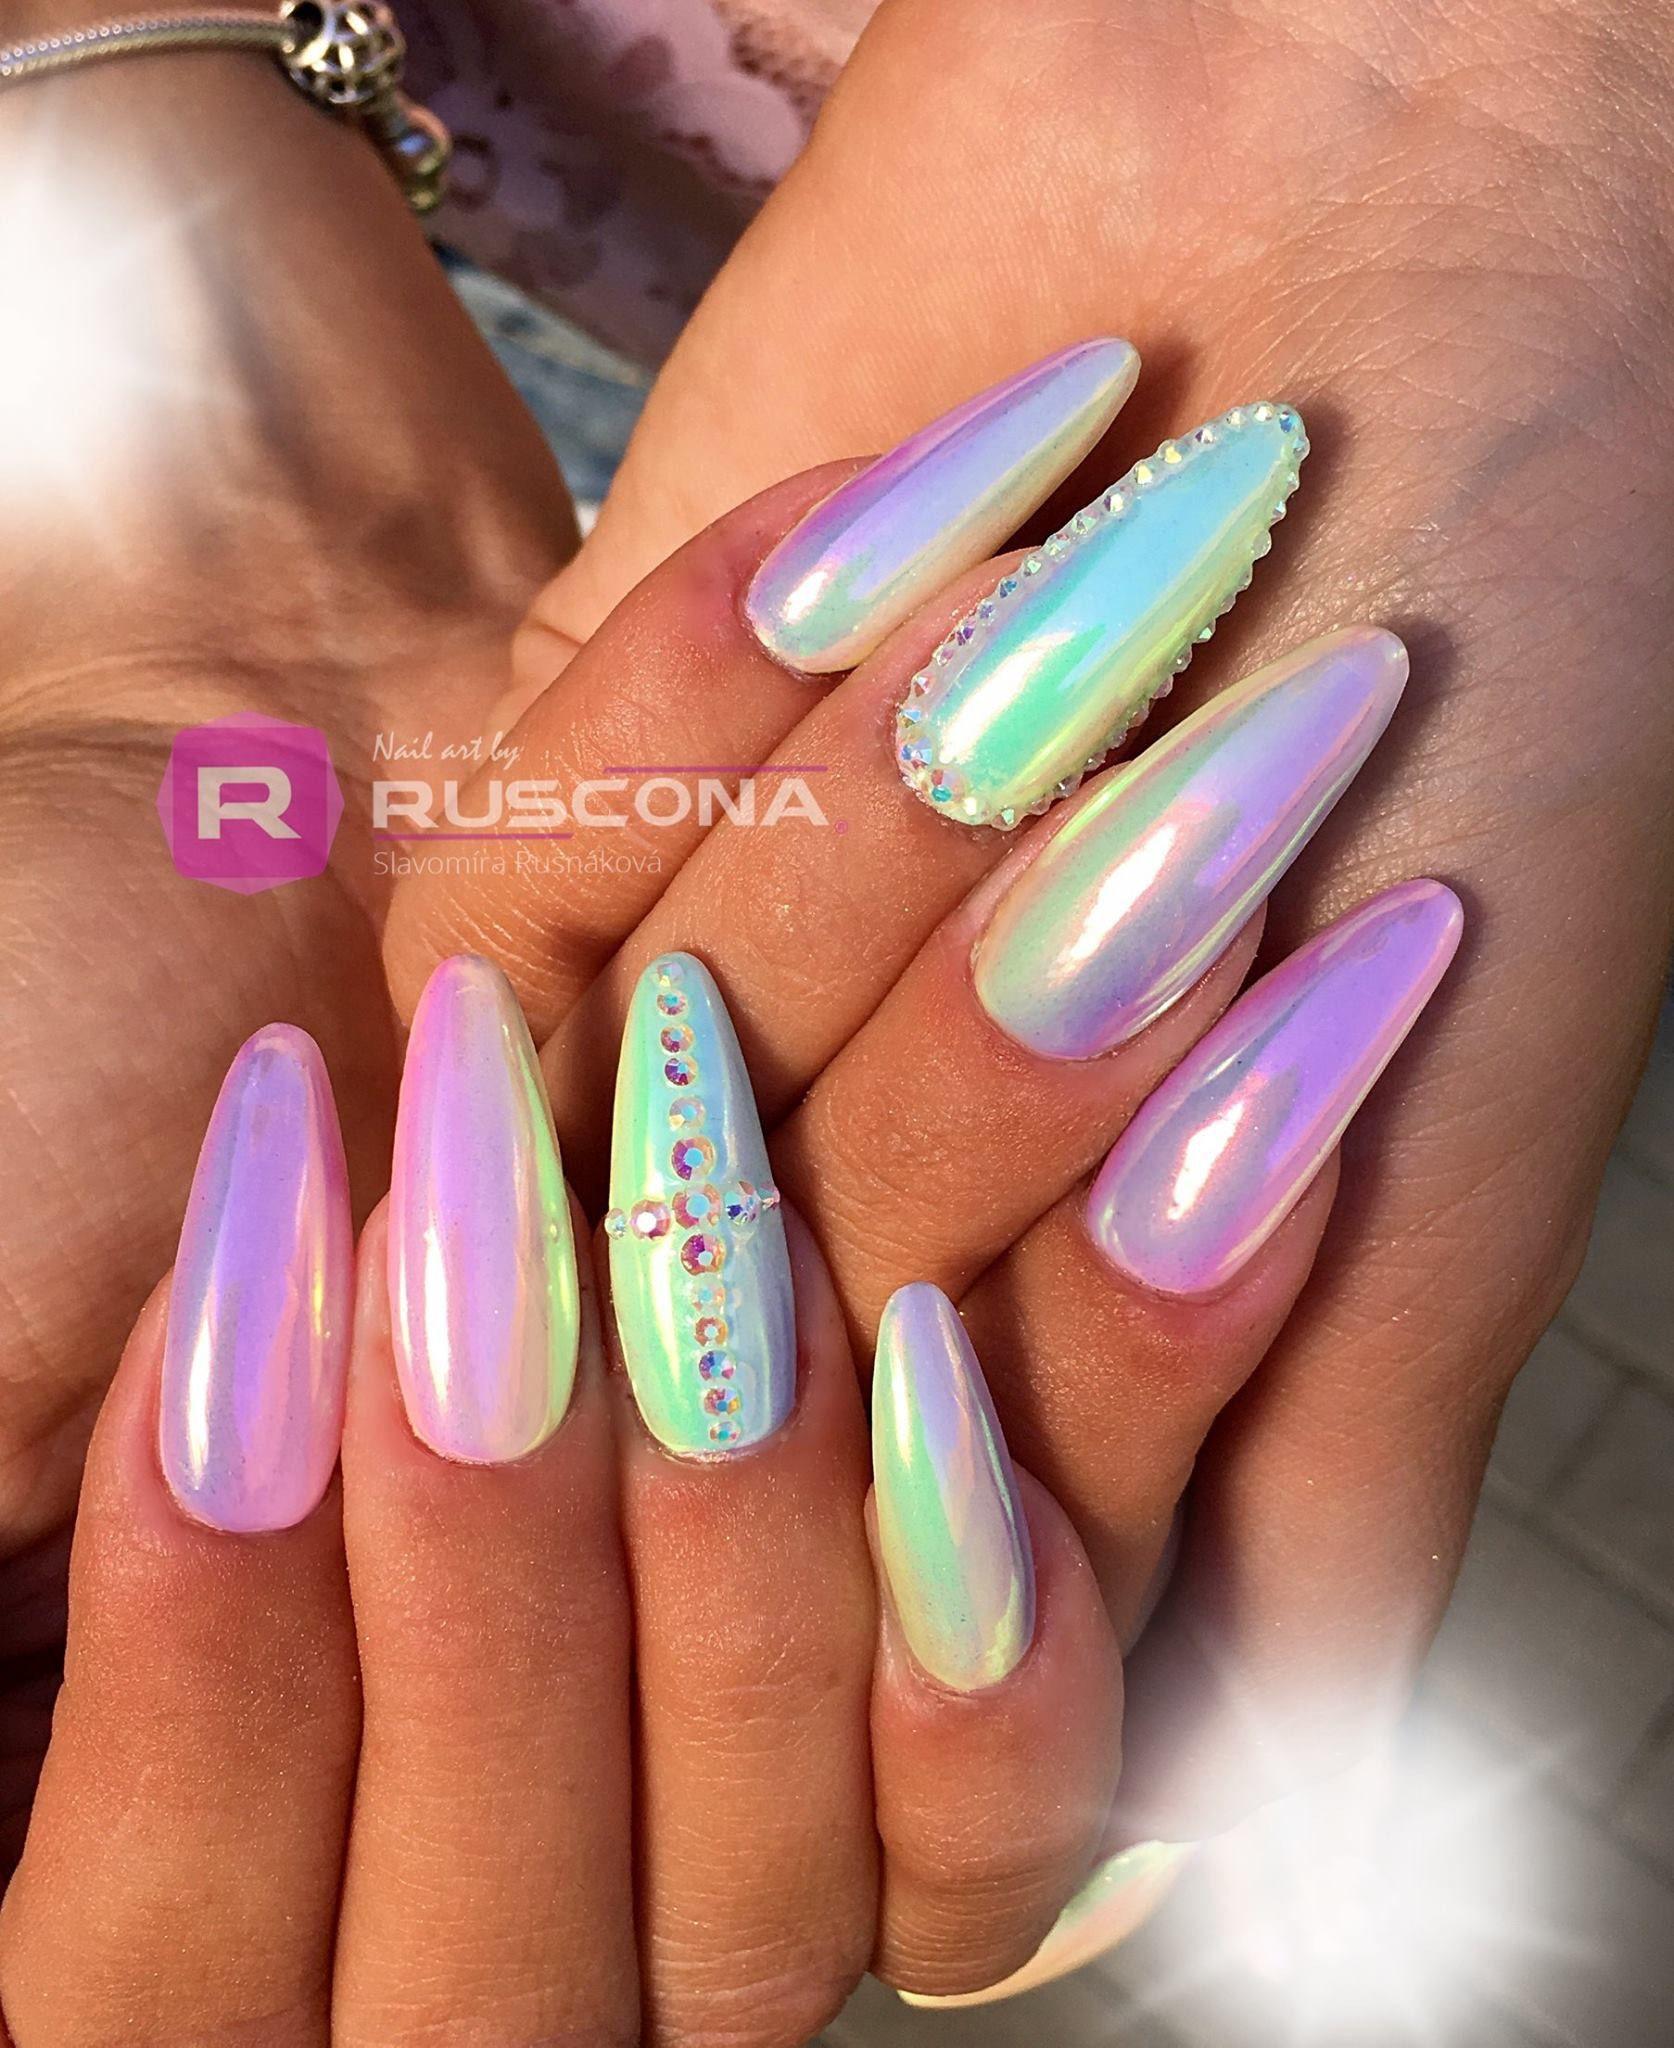 Aurora Nails Gelnails Aurora Auroranails Summernails Ombrenails Rainbownails Longnails Nailart Nailartclub Nailworld Pastelnails Luxurynails Nechty